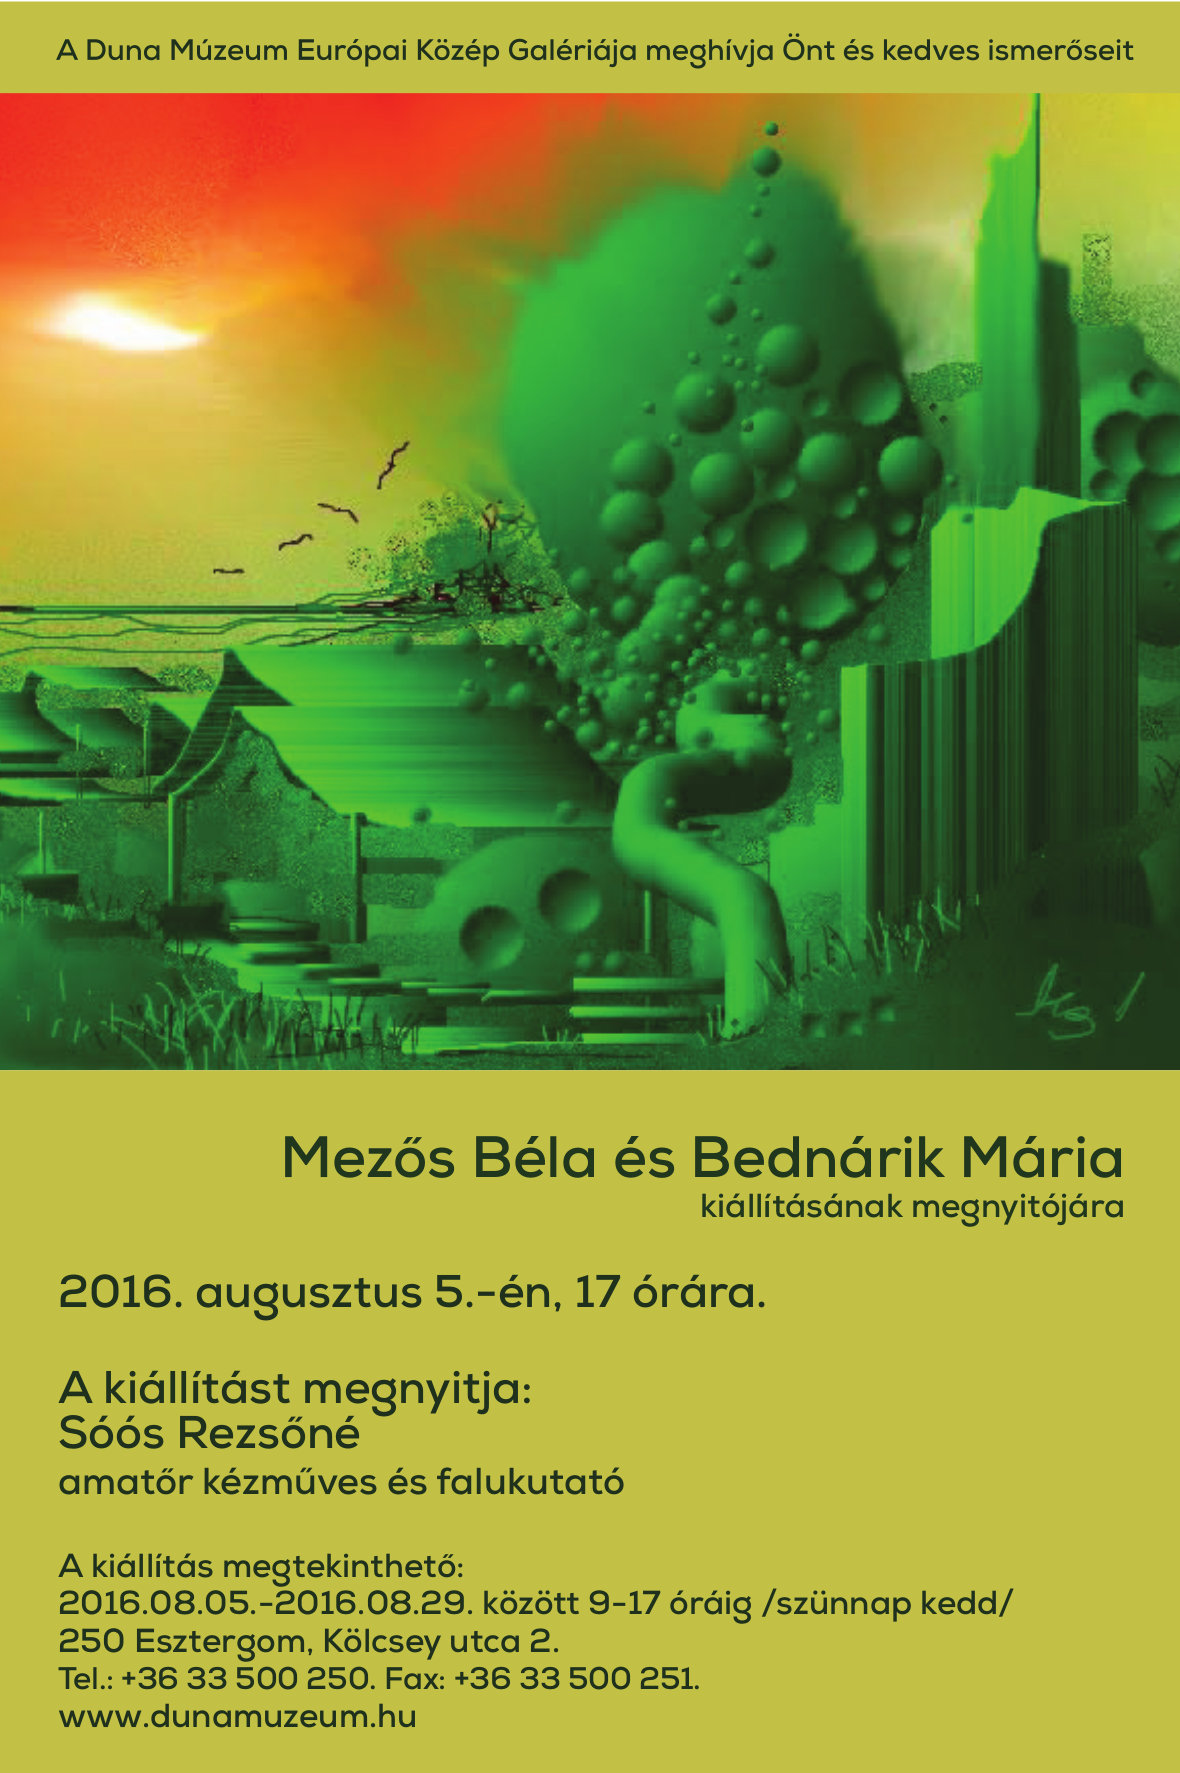 meghivo_mezos_bela.jpg